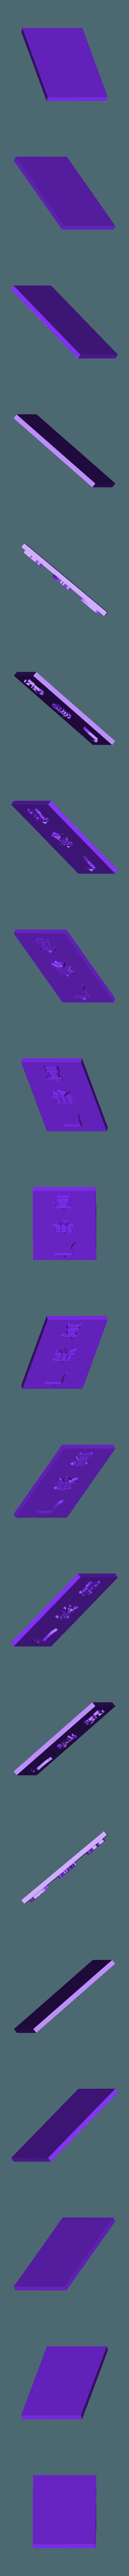 266442.stl Download free STL file Guanghan Palace  Change Fairy • 3D printable design, stronghero3d